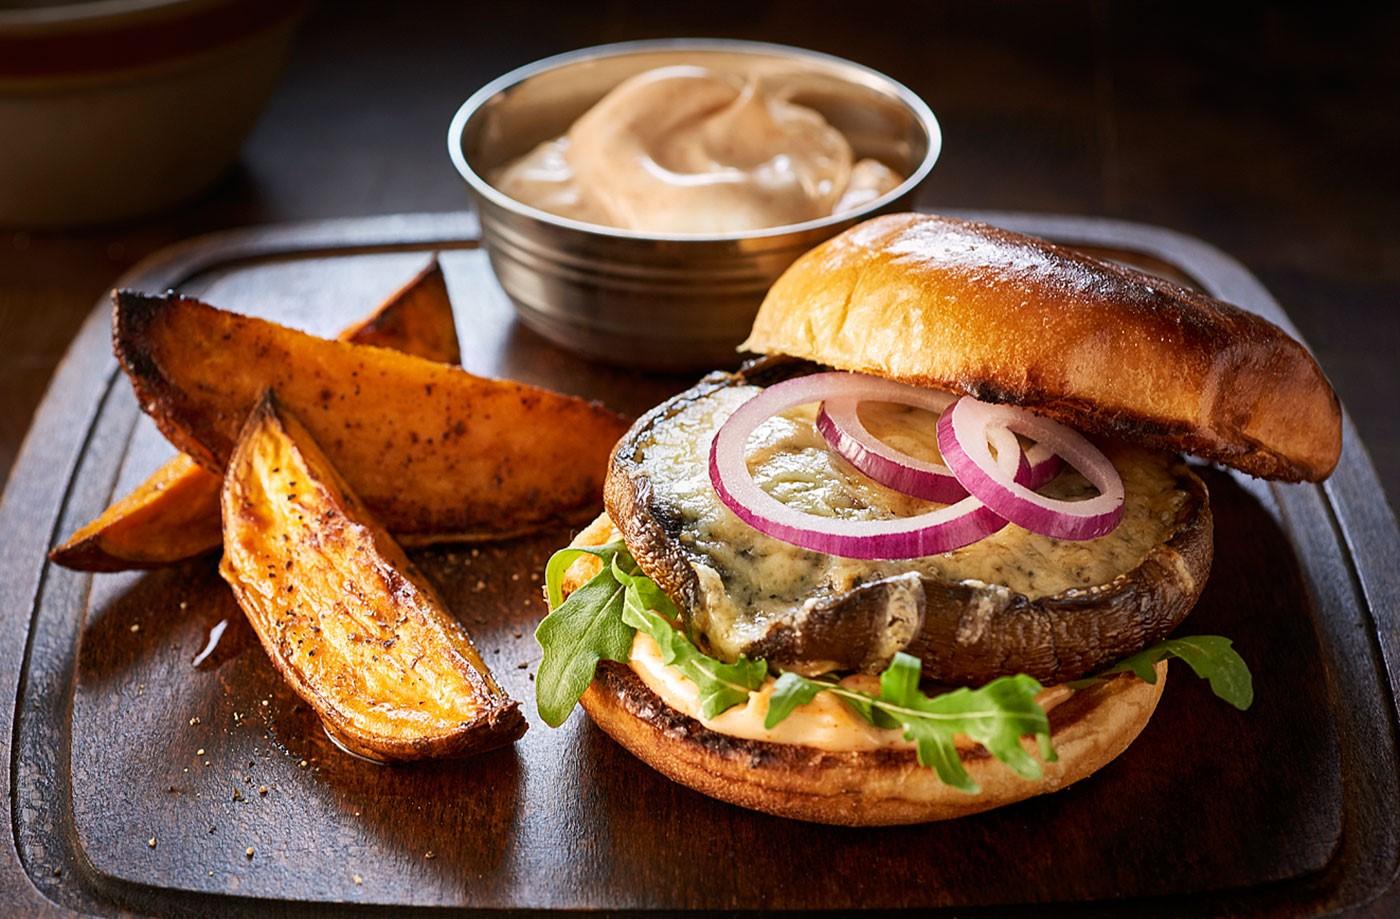 Mushroom-burger-LGH-57c41bd9-4380-4ac9-8e1e-a91b2003746c-0-1400x919